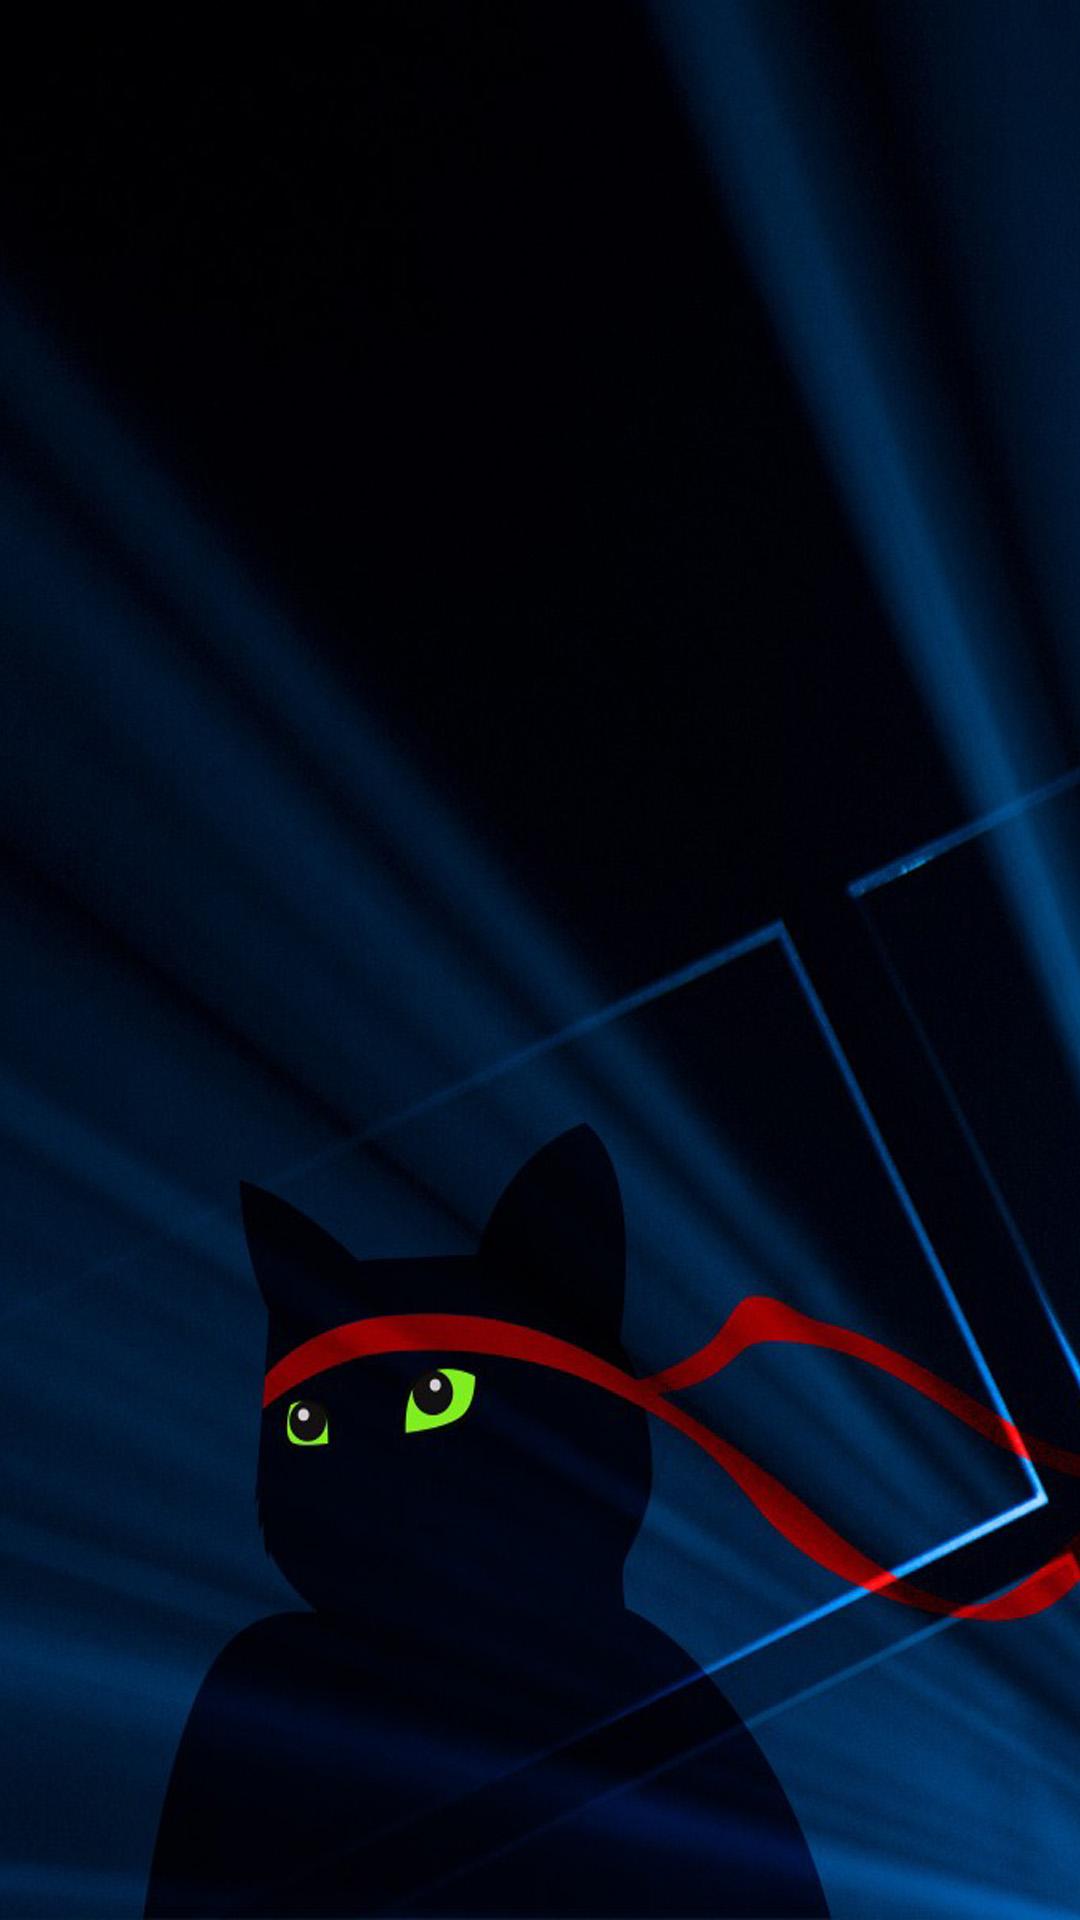 Windows 10 Ninja Cat Dark 4k Ultra Hd Mobile Wallpaper